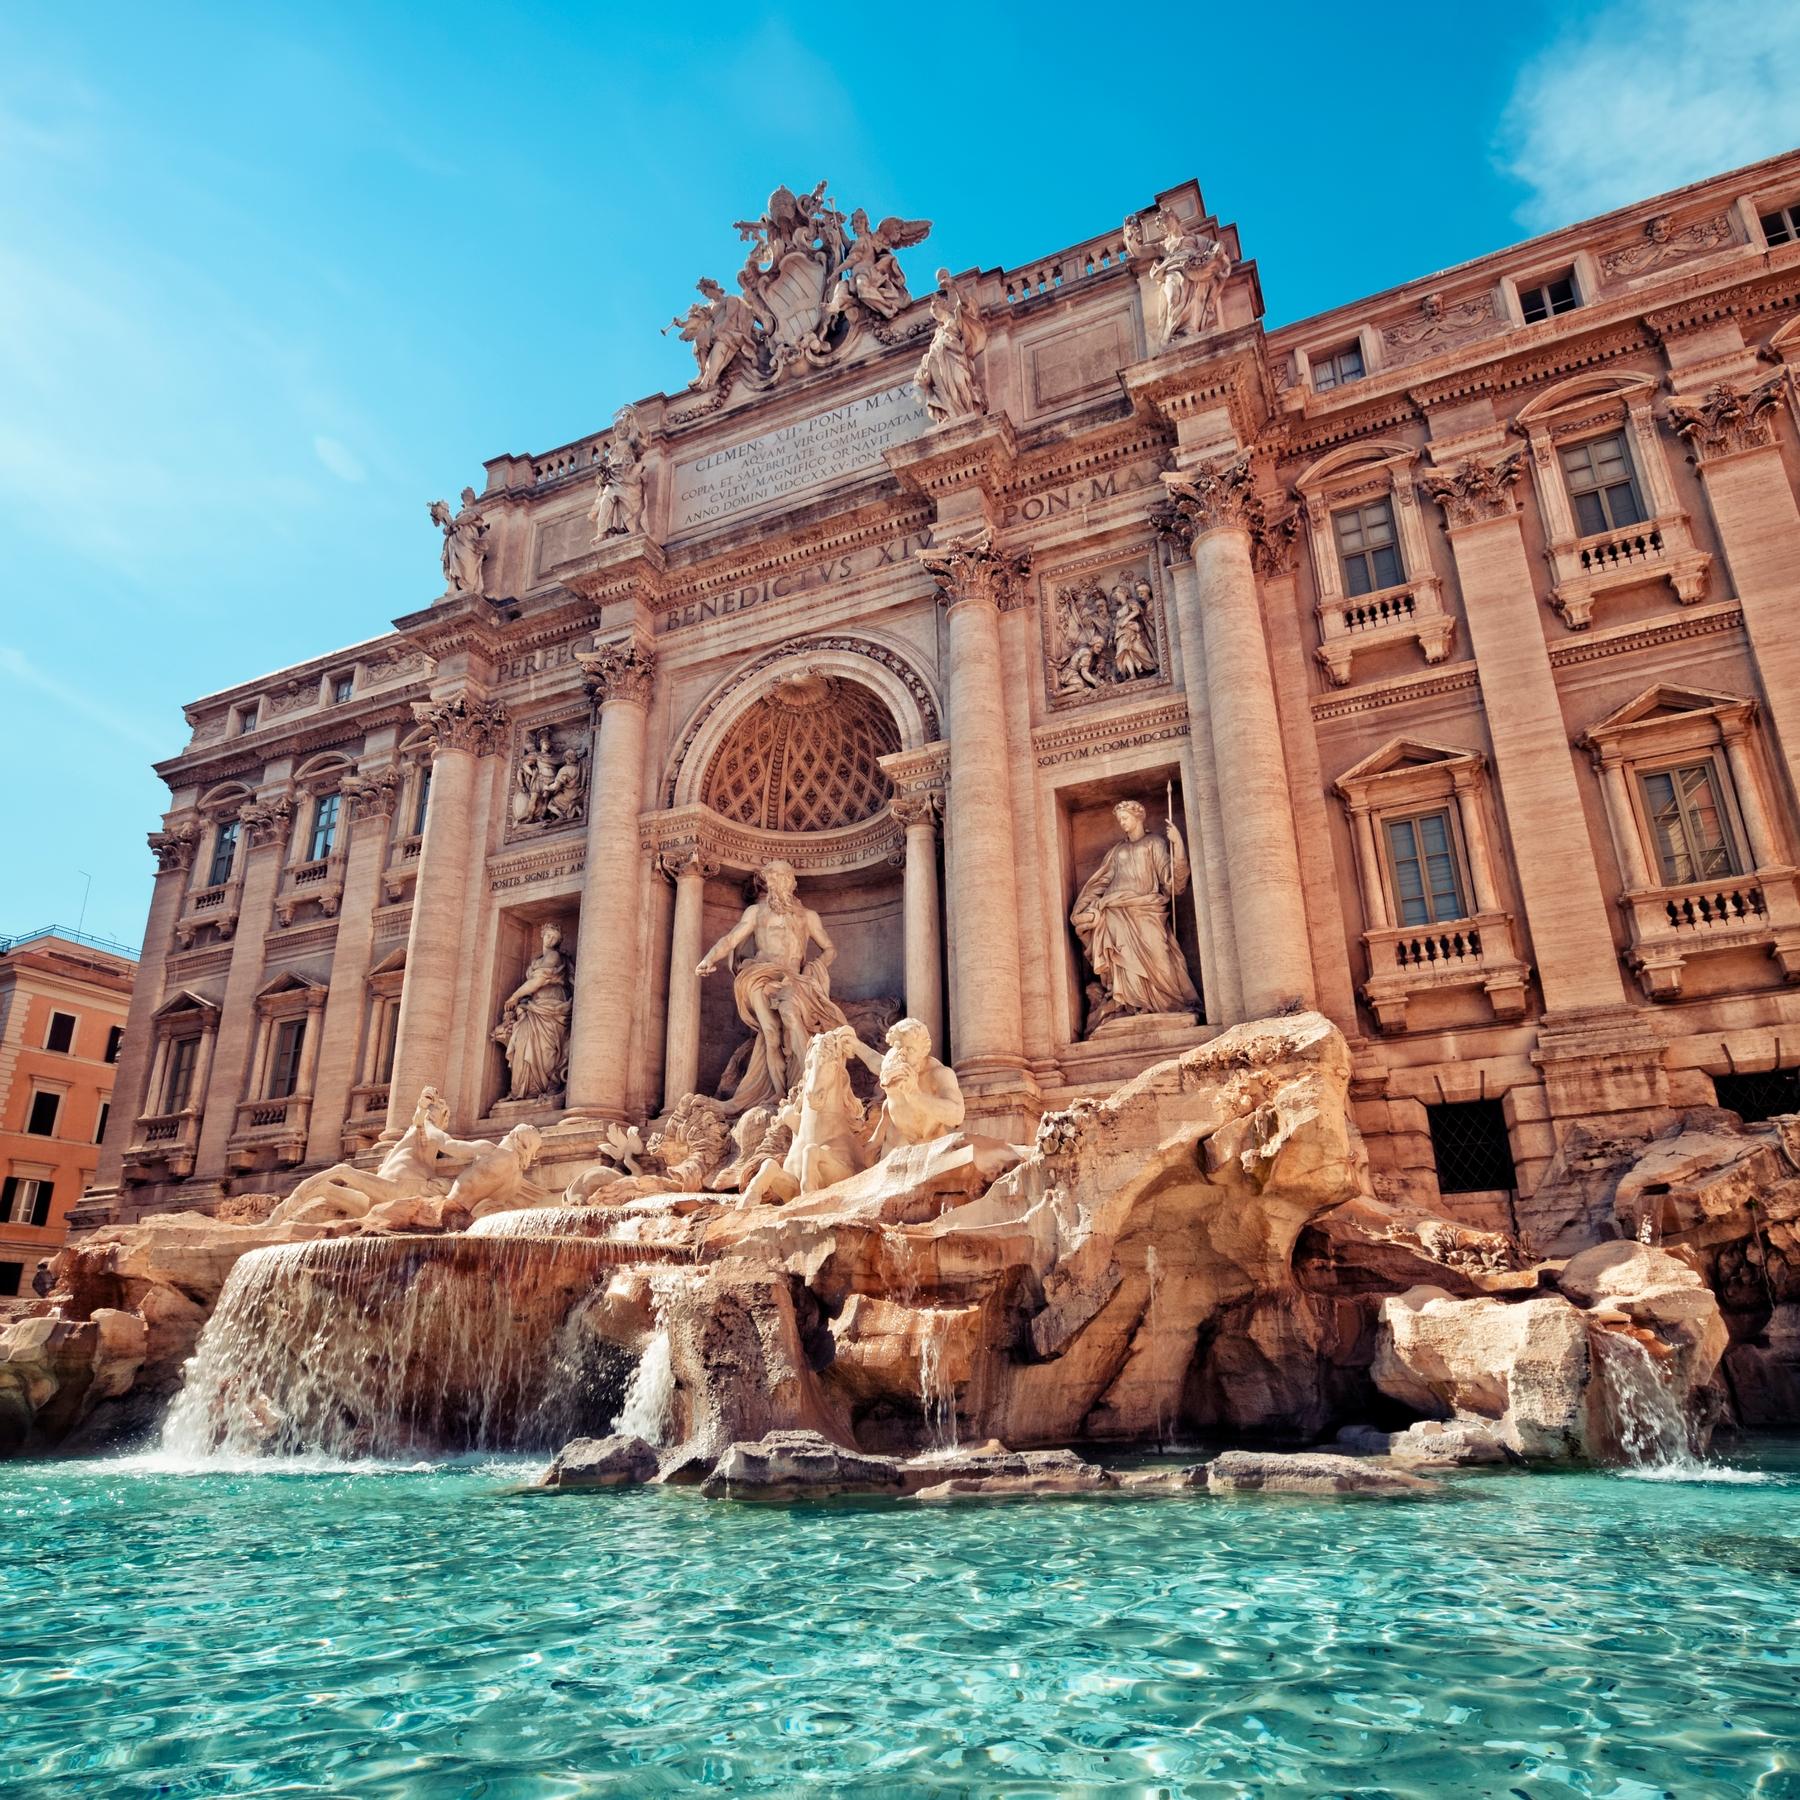 Достопримечательности Рима — фонтан Треви